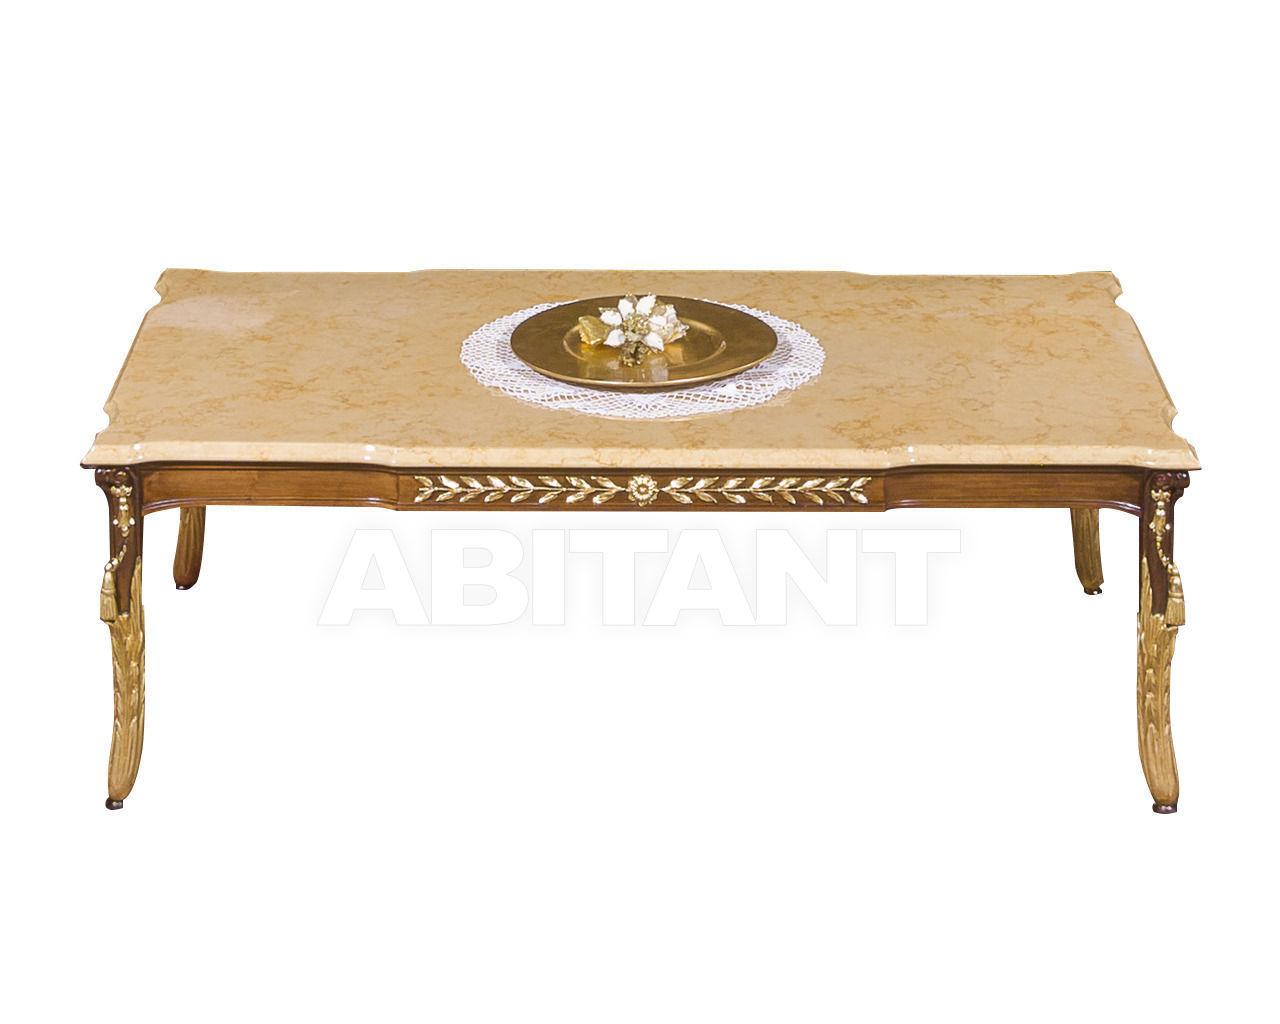 Купить Столик журнальный Stil Salotti di Origgi Luigi e Figli s.n.c. 2013 EMPIRE coffe table